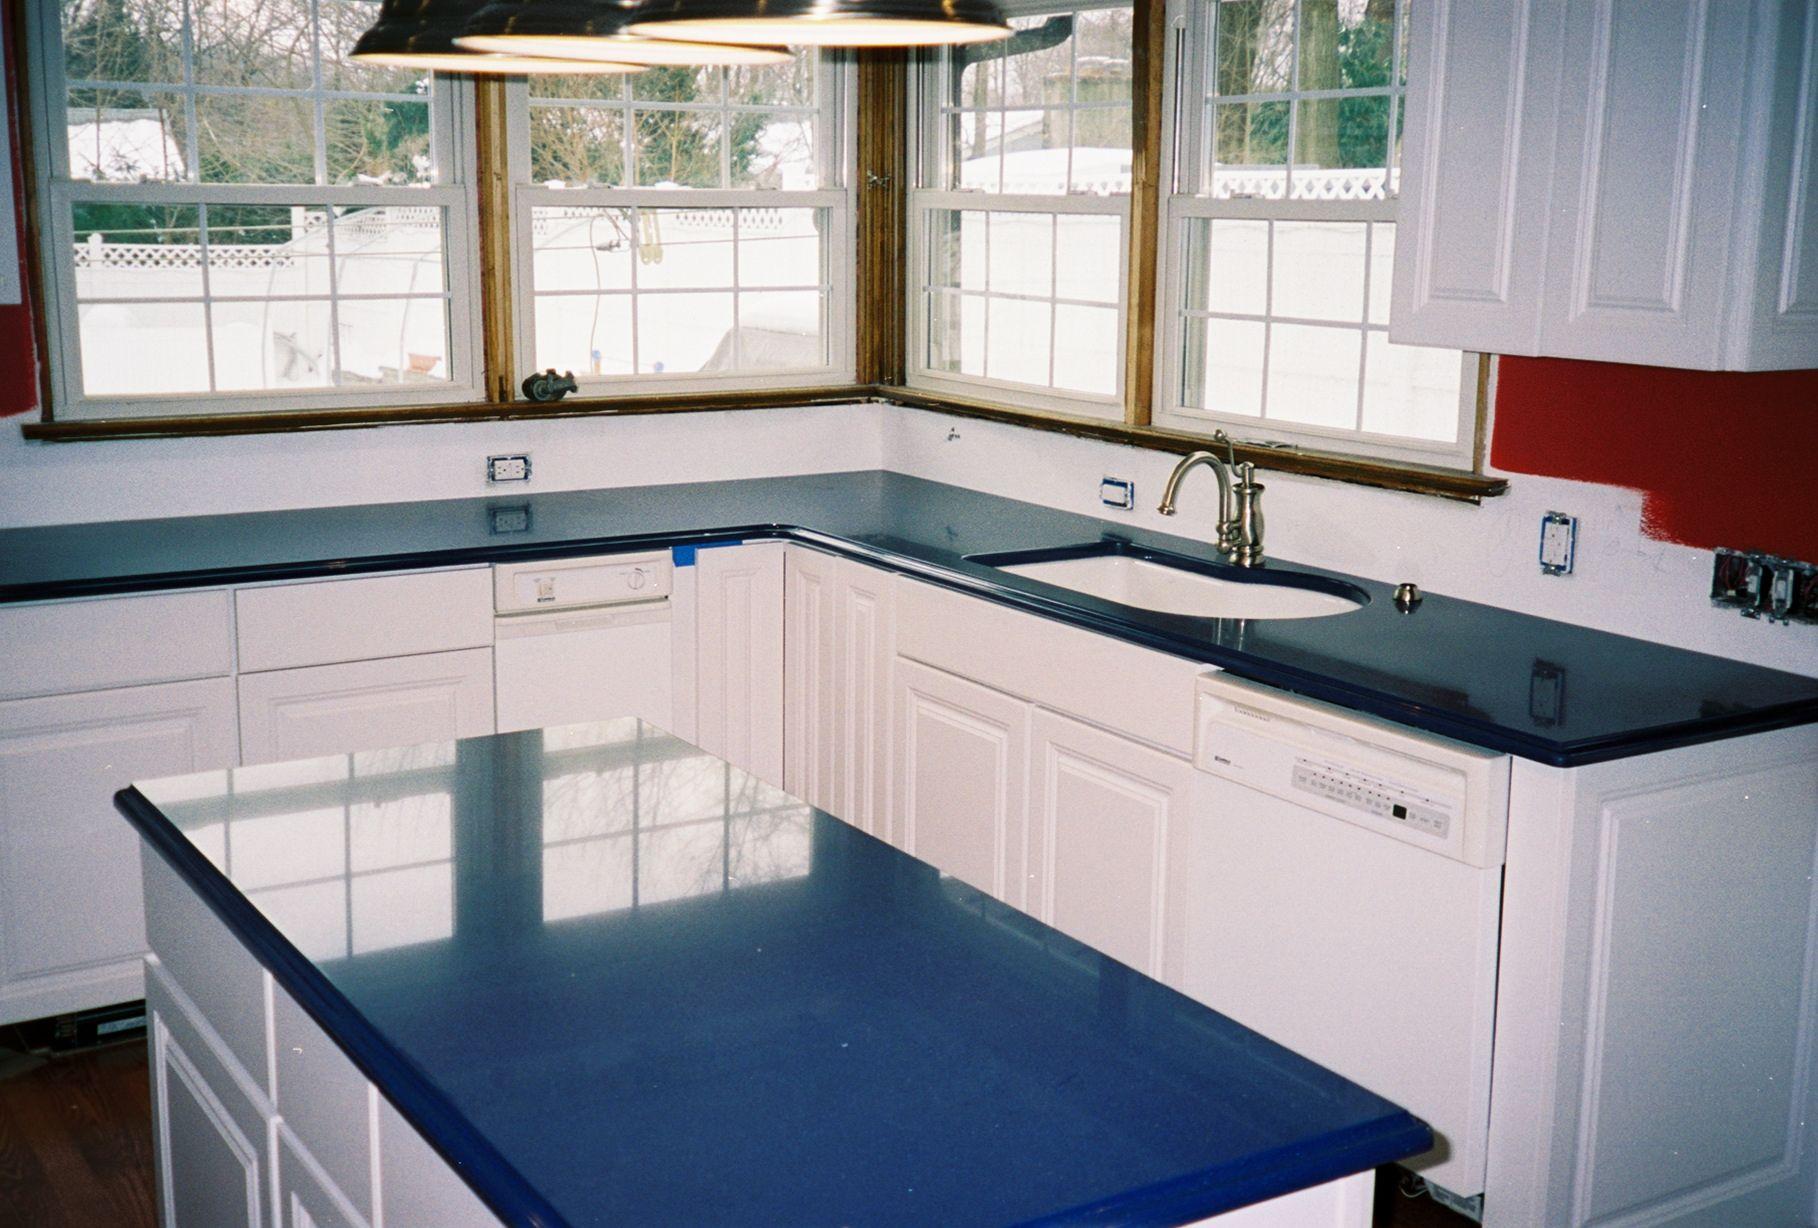 Cobalt Blue Kitchen Countertops Blue Countertops Blue Kitchen